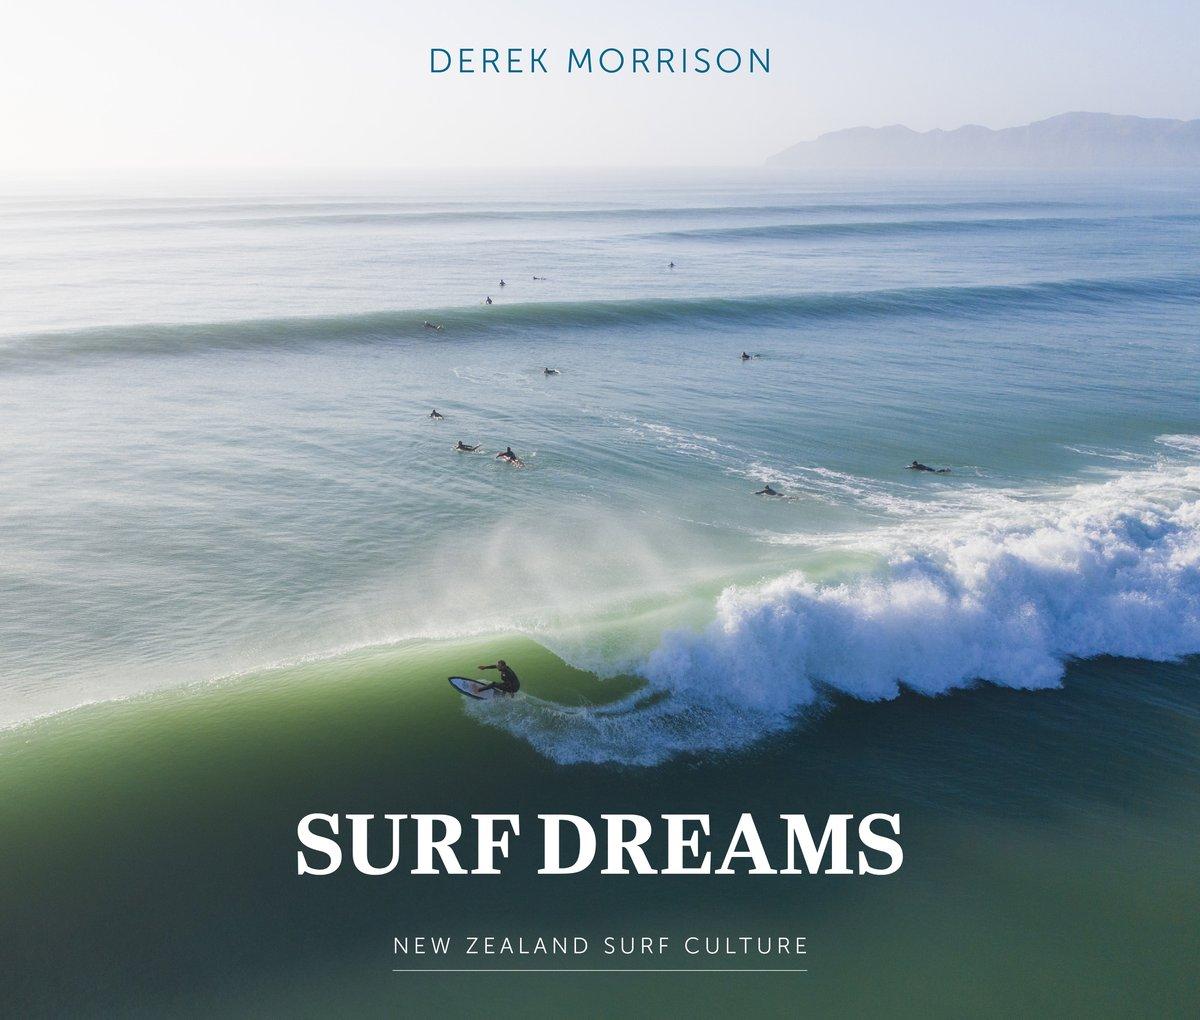 Surf Dreams -New Zealand Surf Culture -Derek Morrison